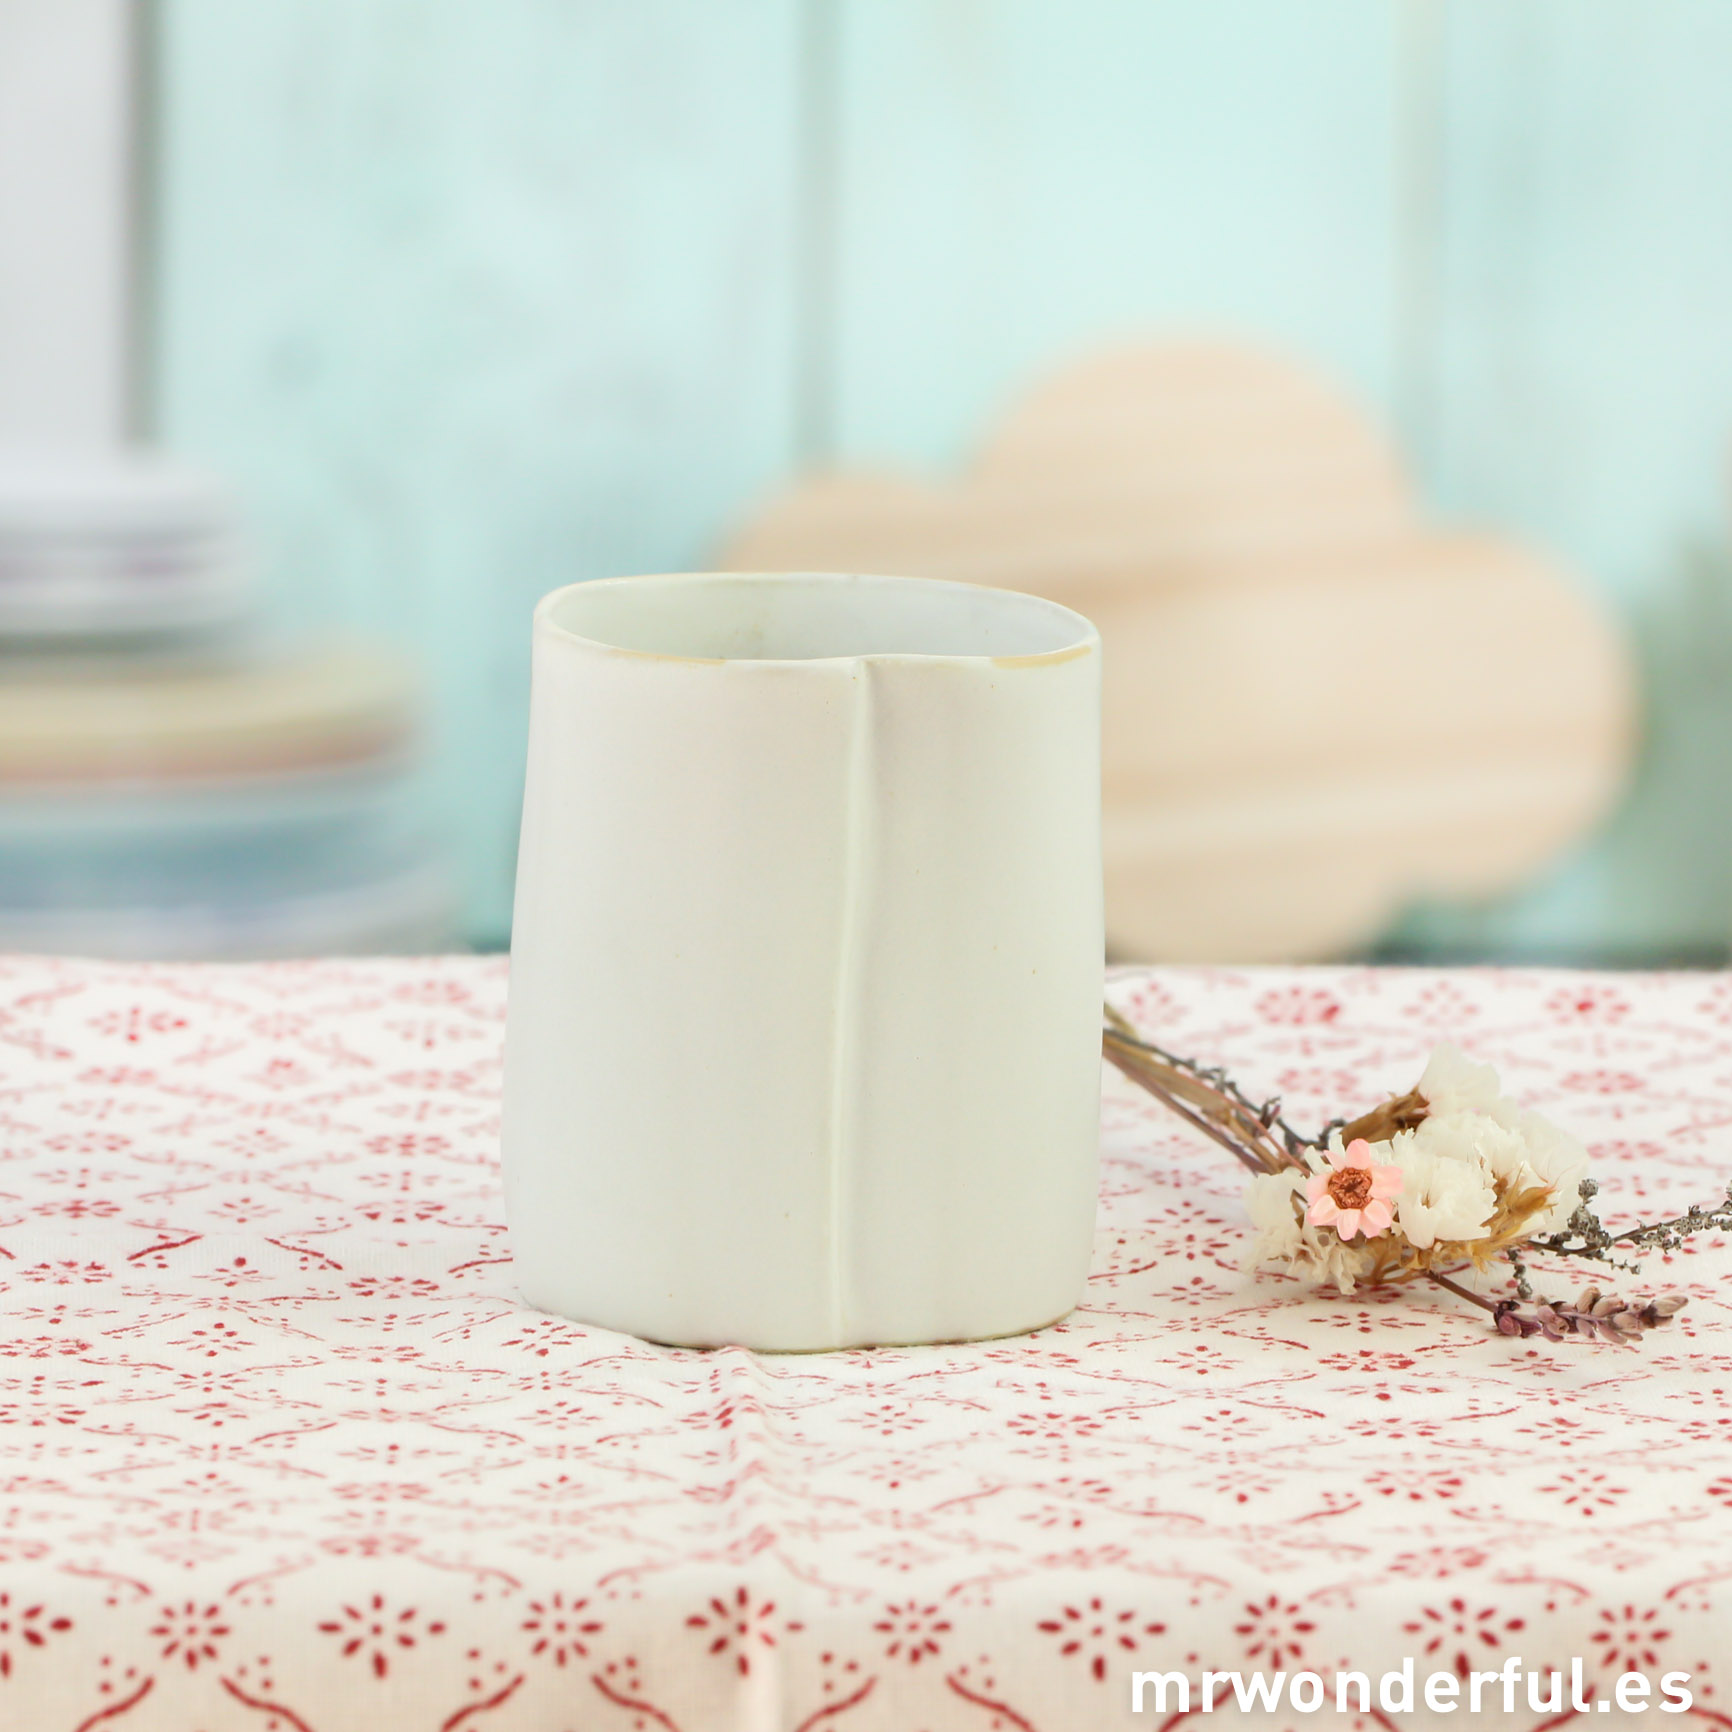 mrwonderful_053138_vaso-ceramica-blanco-1